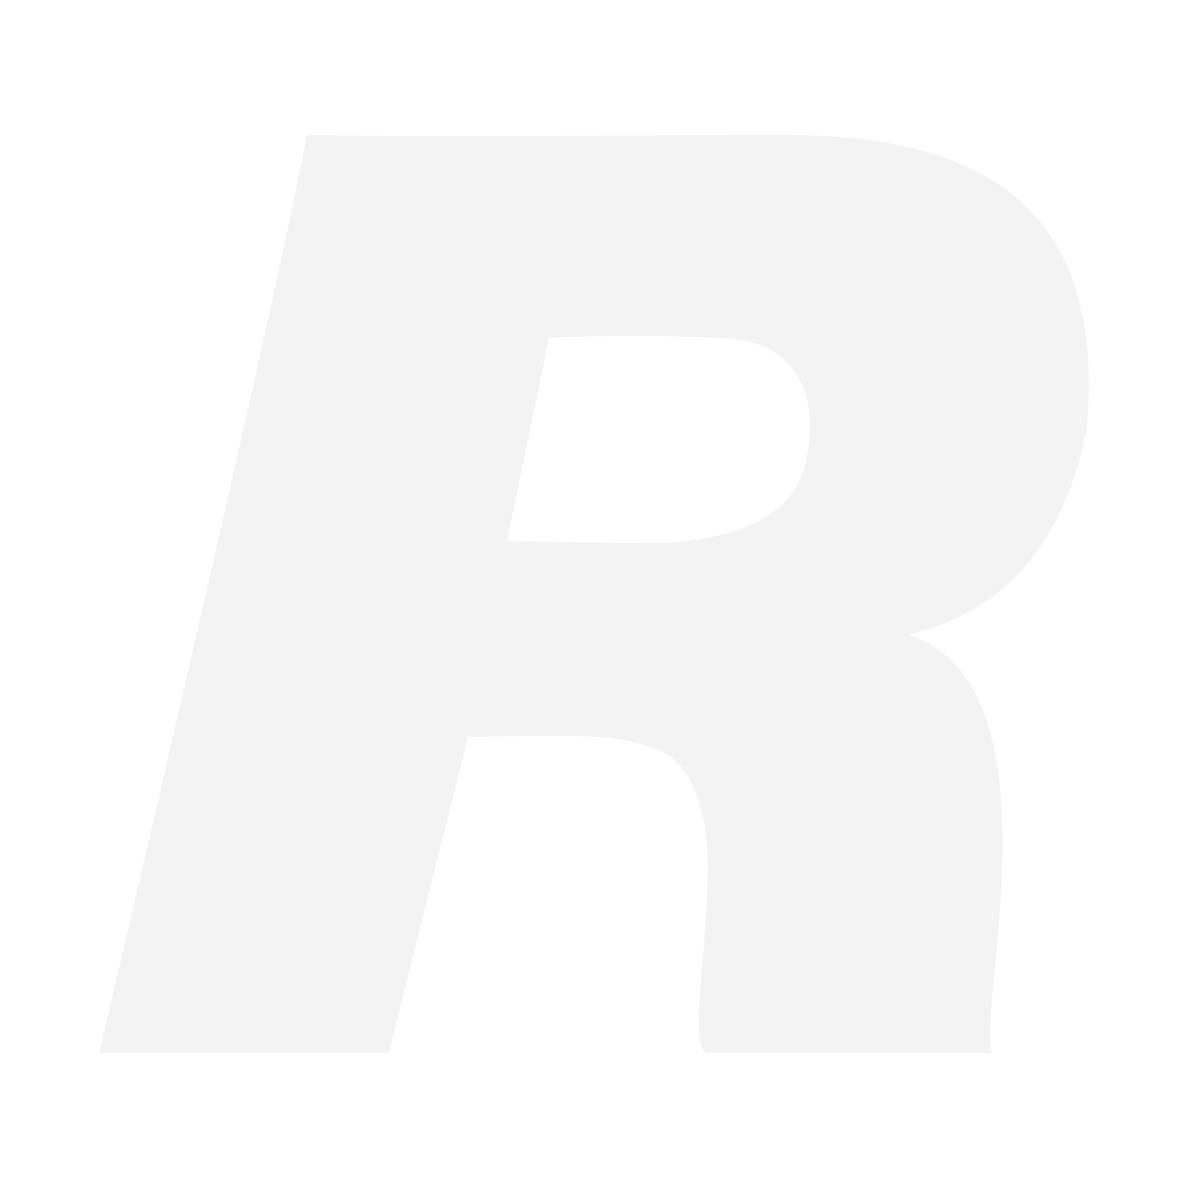 Fujifilm RR-100